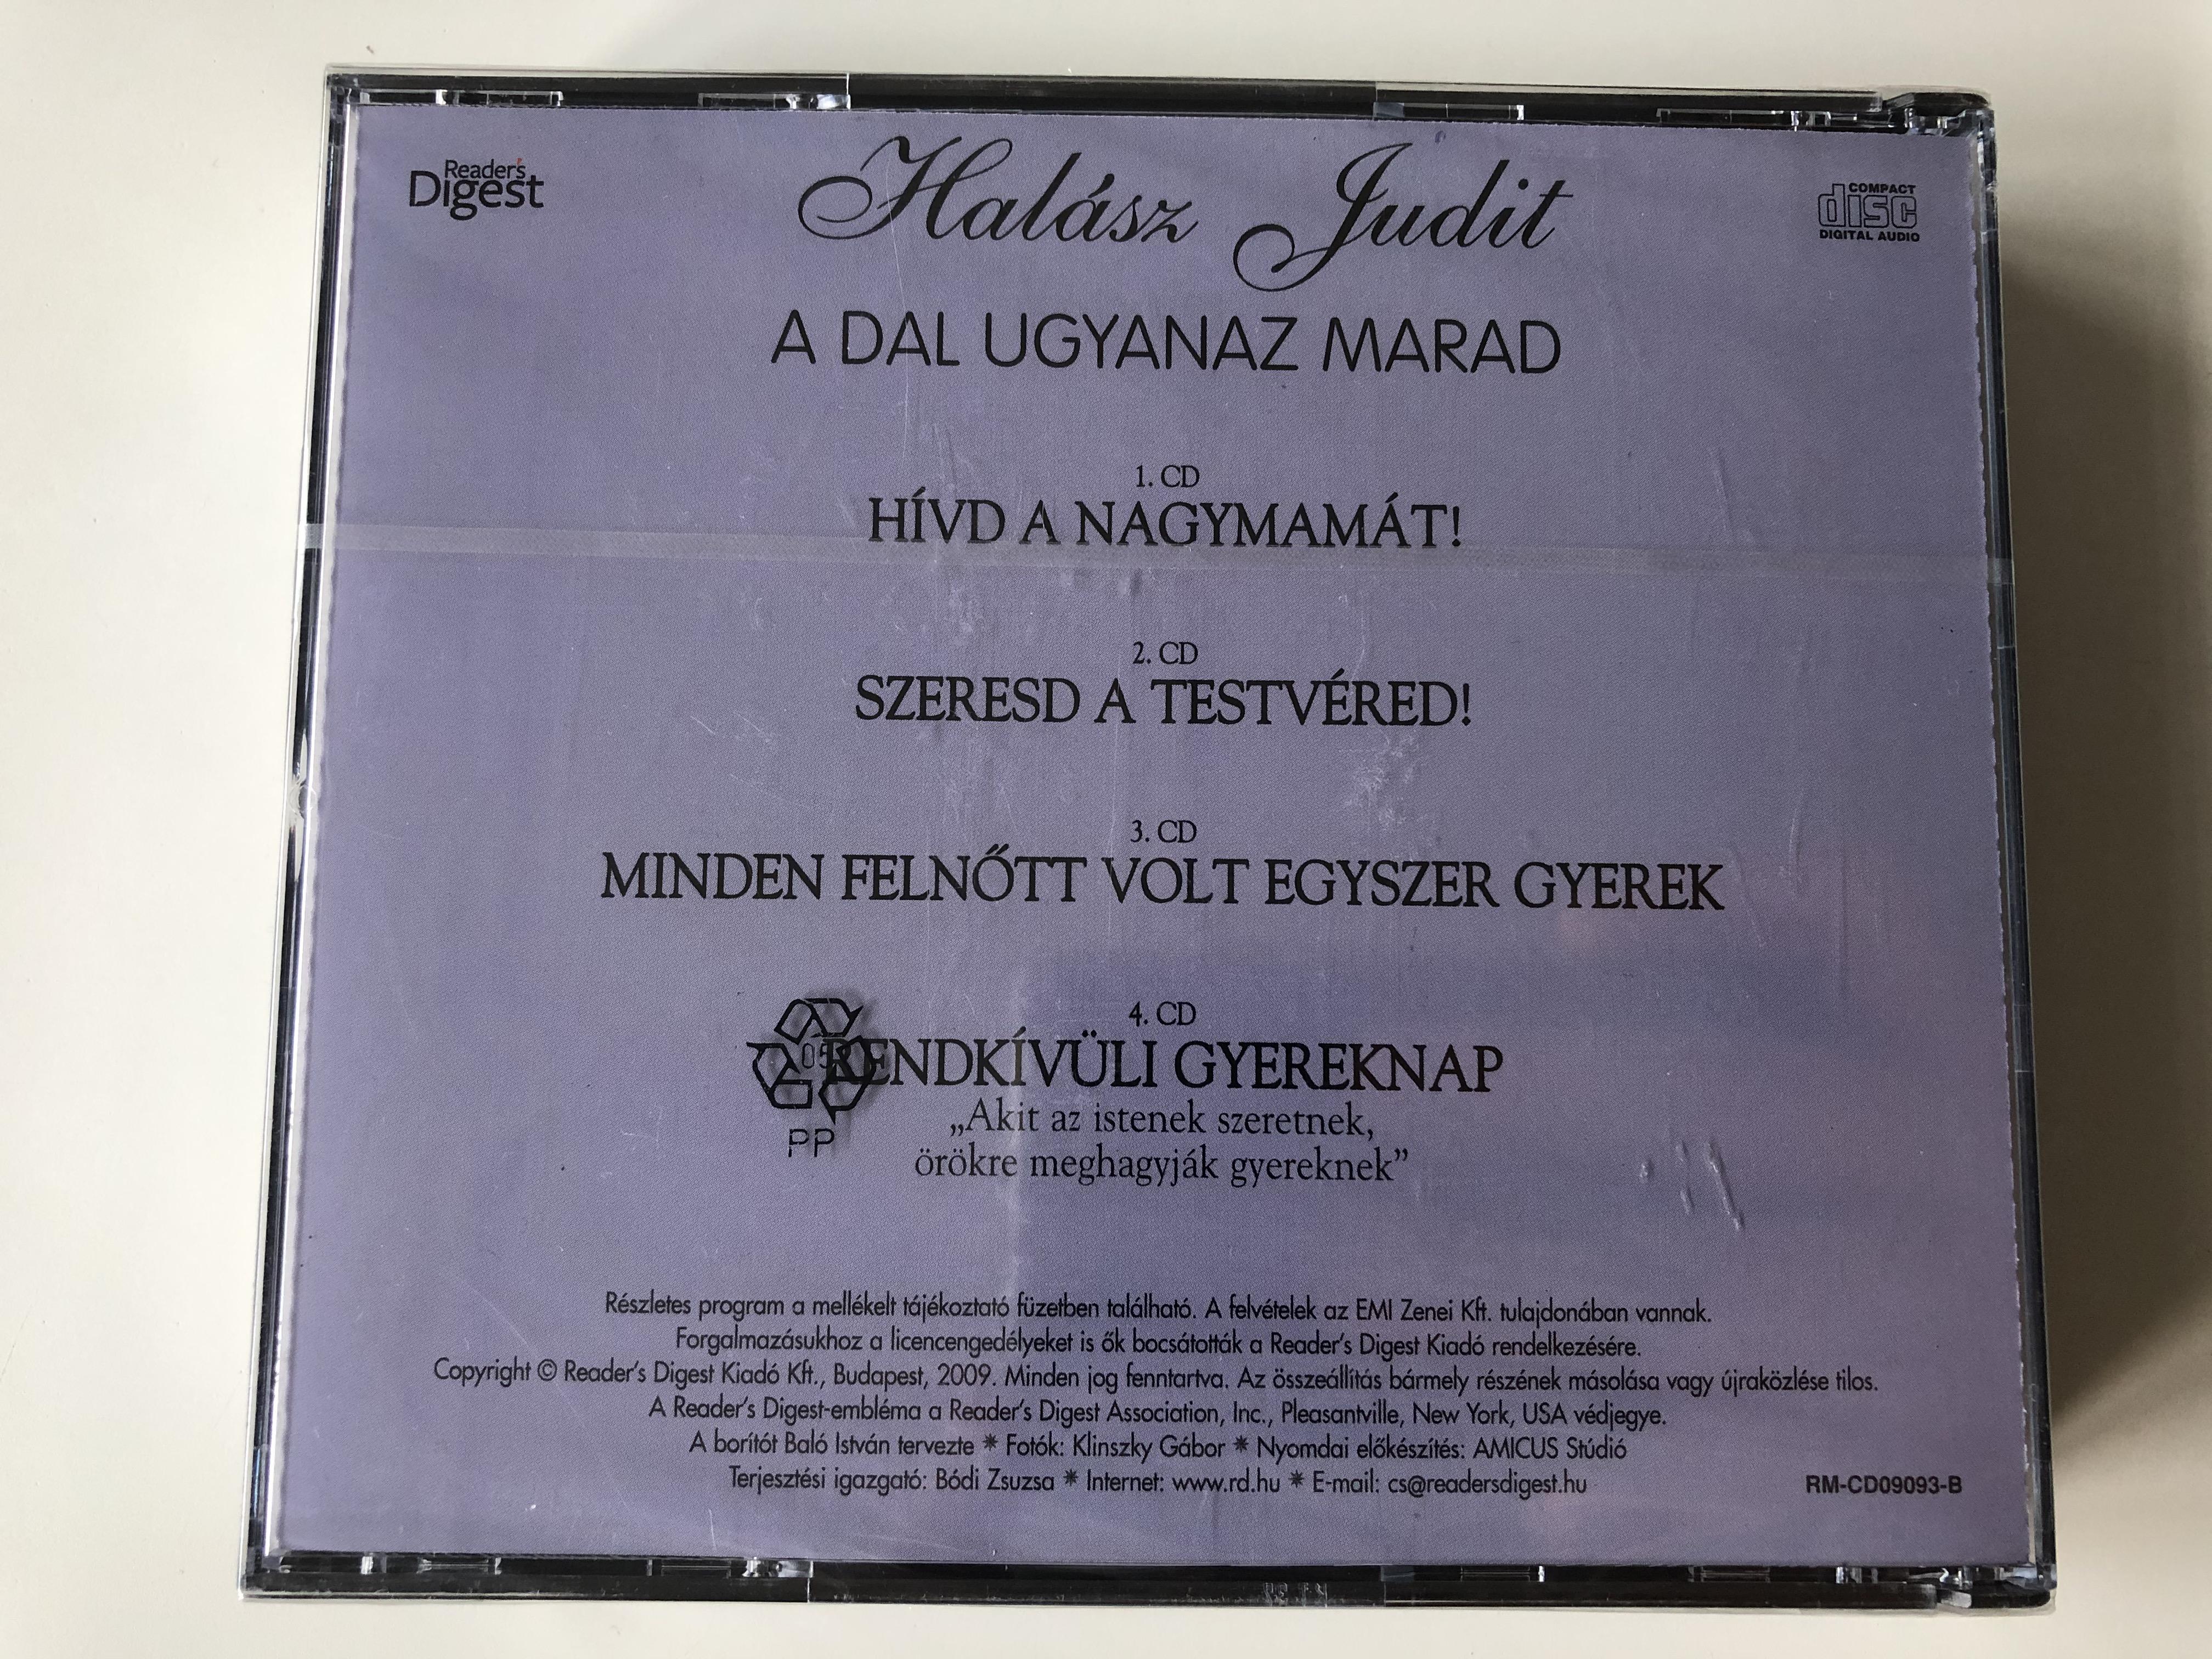 hal-sz-judit-a-dal-ugyanaz-marad-reader-s-digest-4x-audio-cd-2009-rm-cd09093-b-2-.jpg